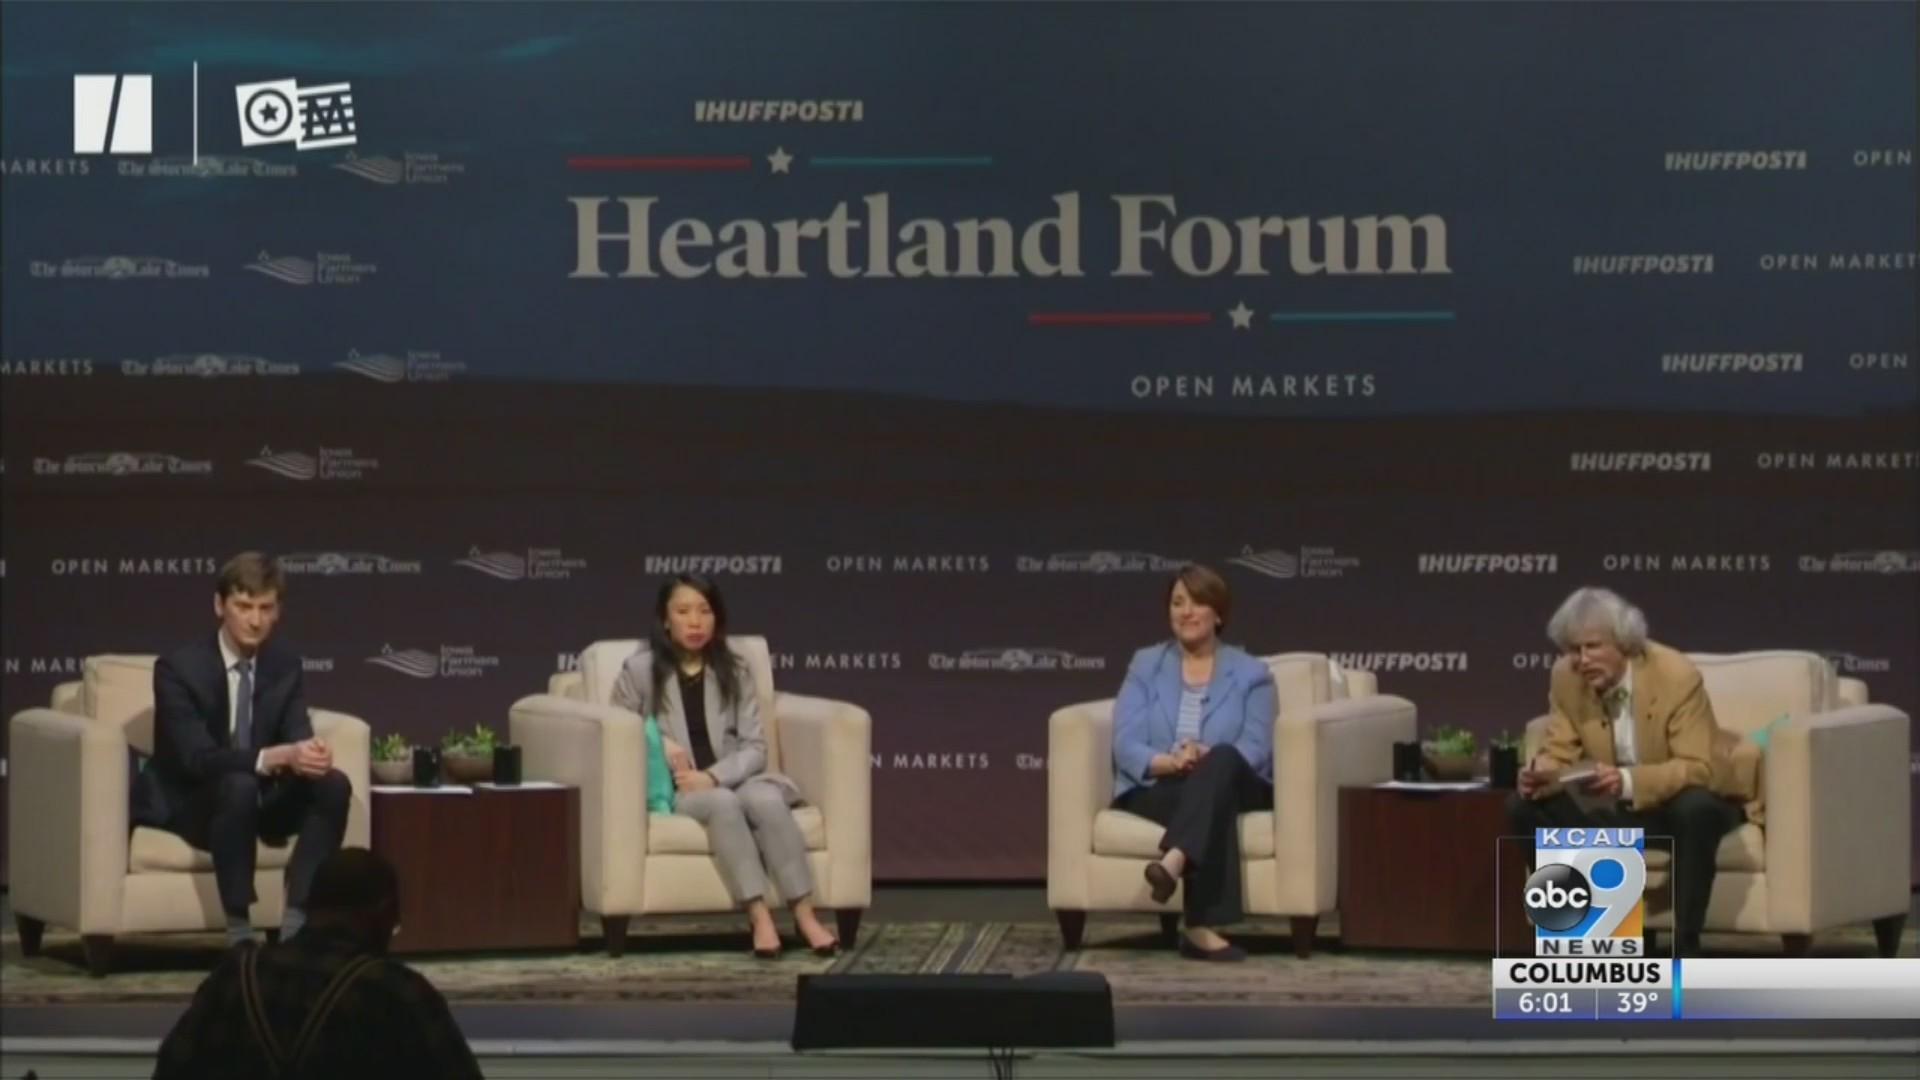 Heartland Forum